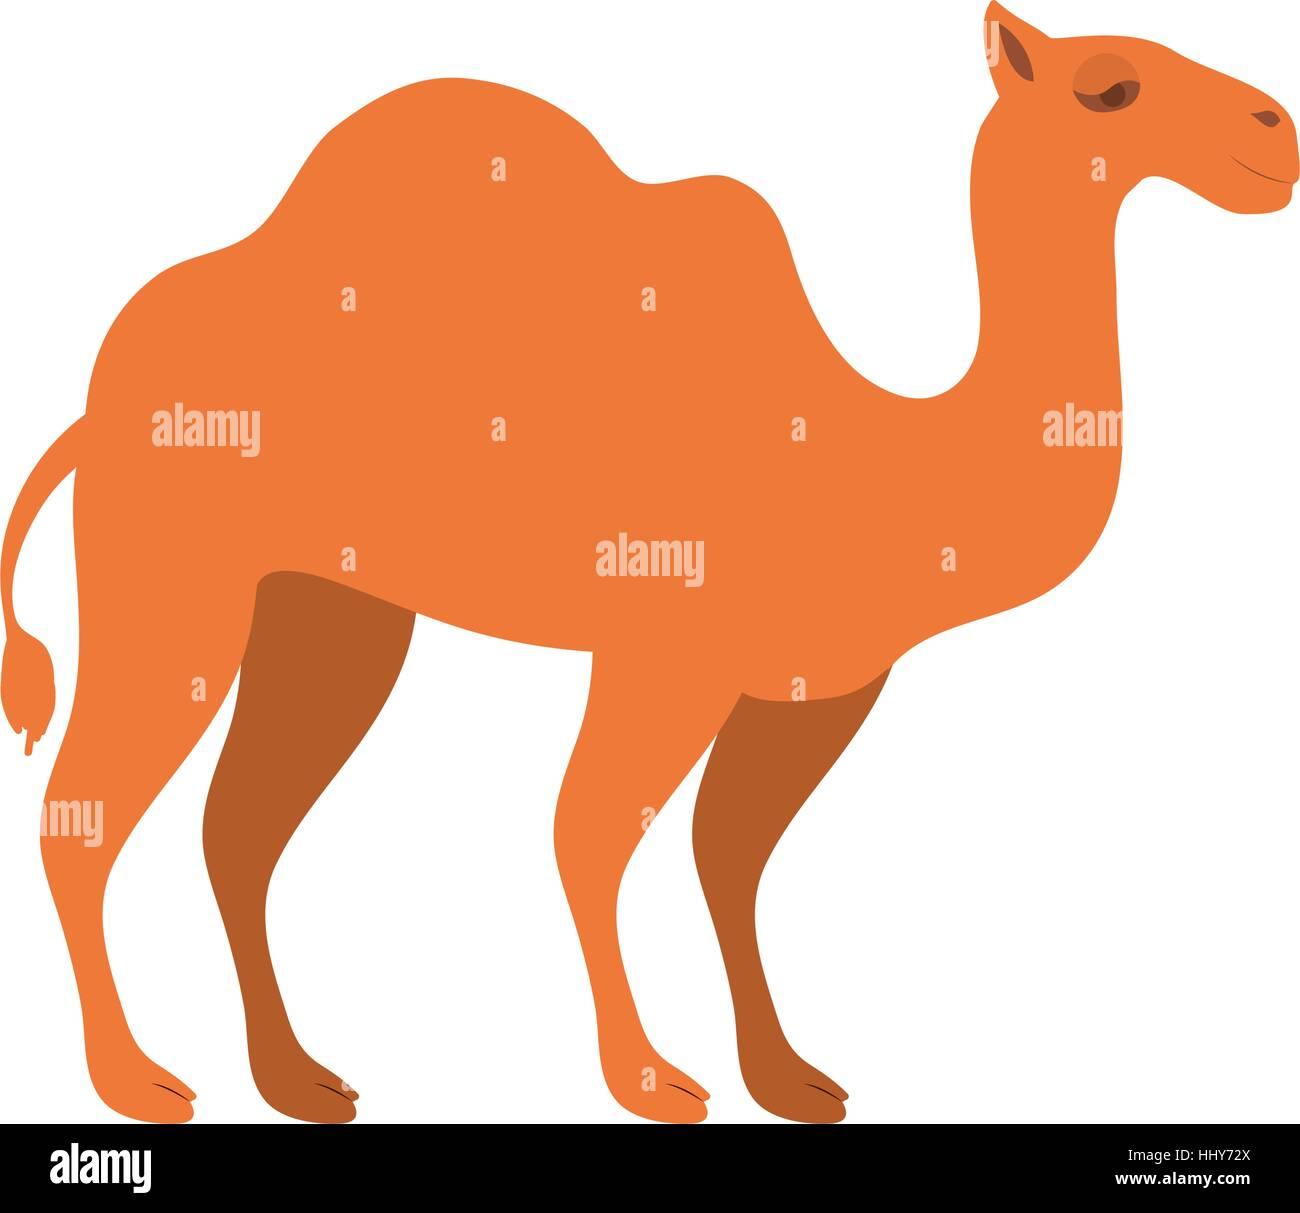 Animal Figure Of Camel Cartoon Vector Illustration Stock